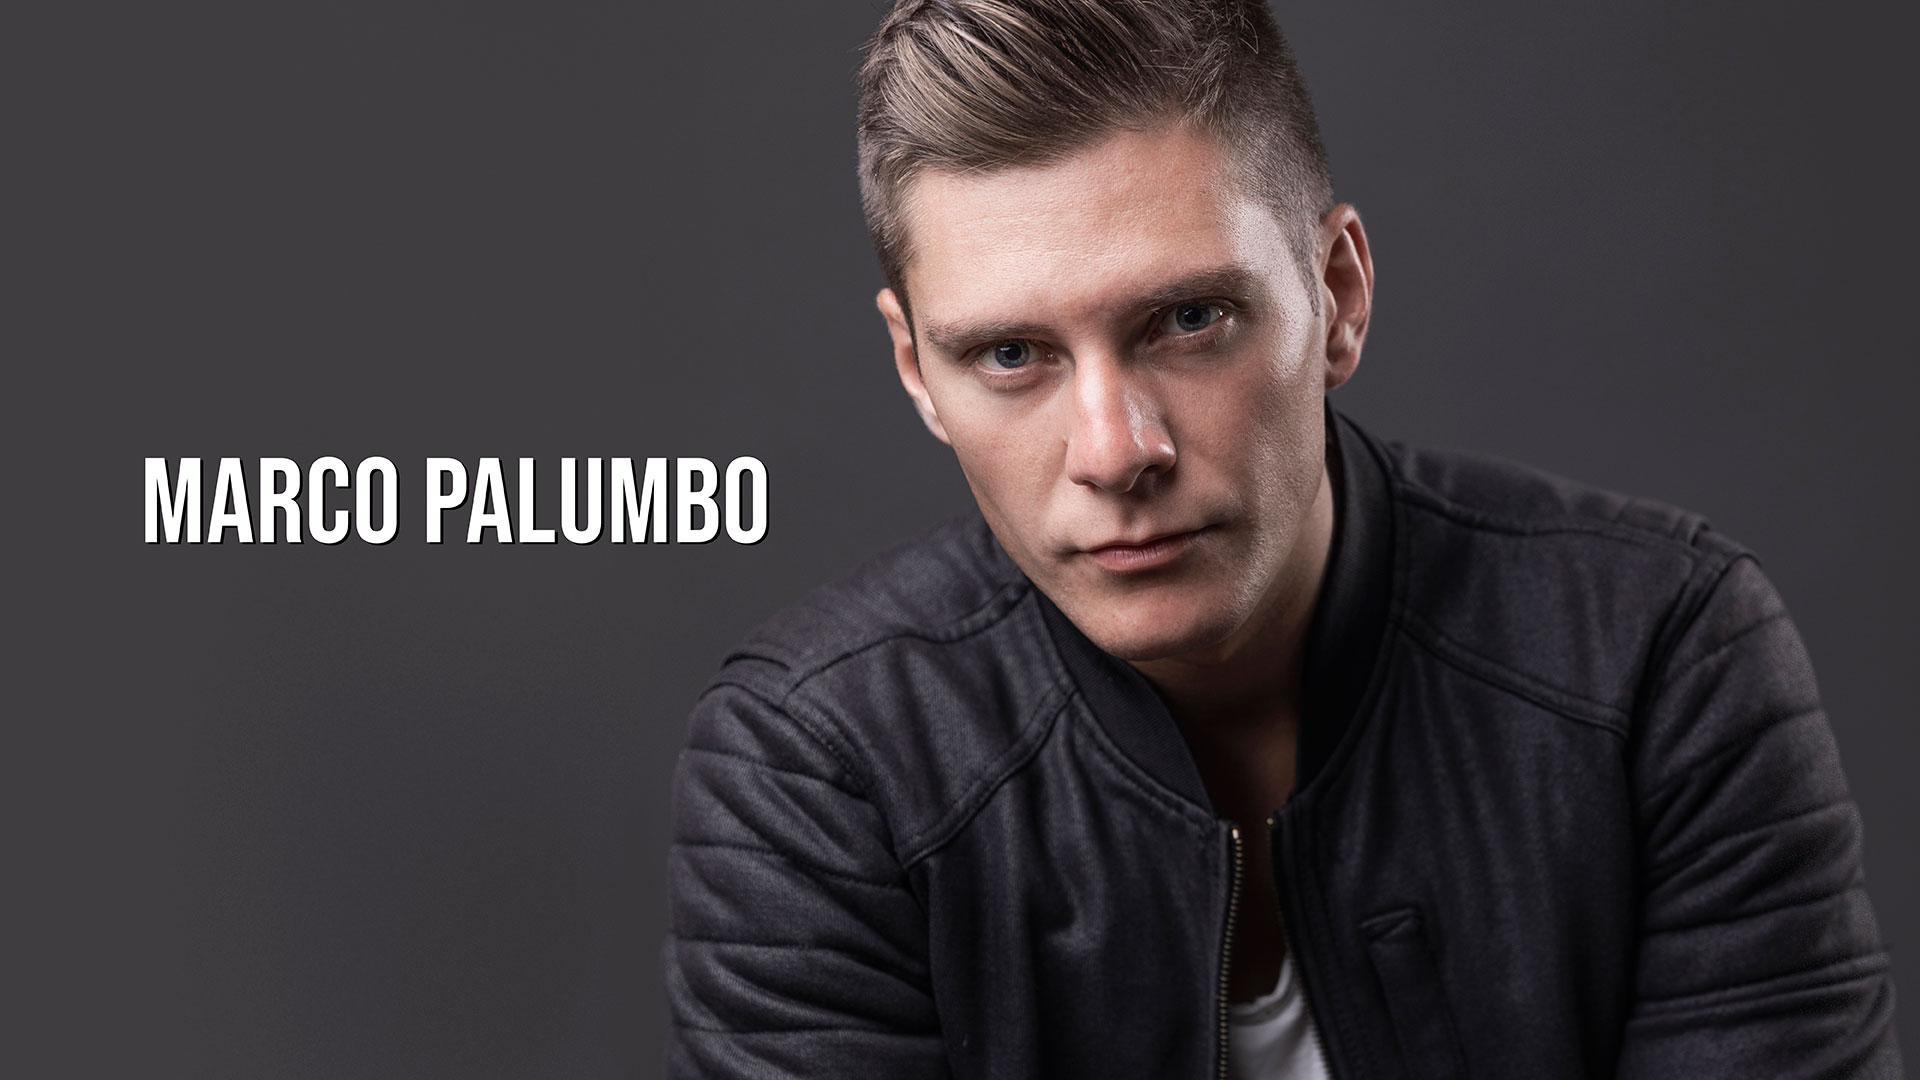 Marco Palumbo - Videobook Actor